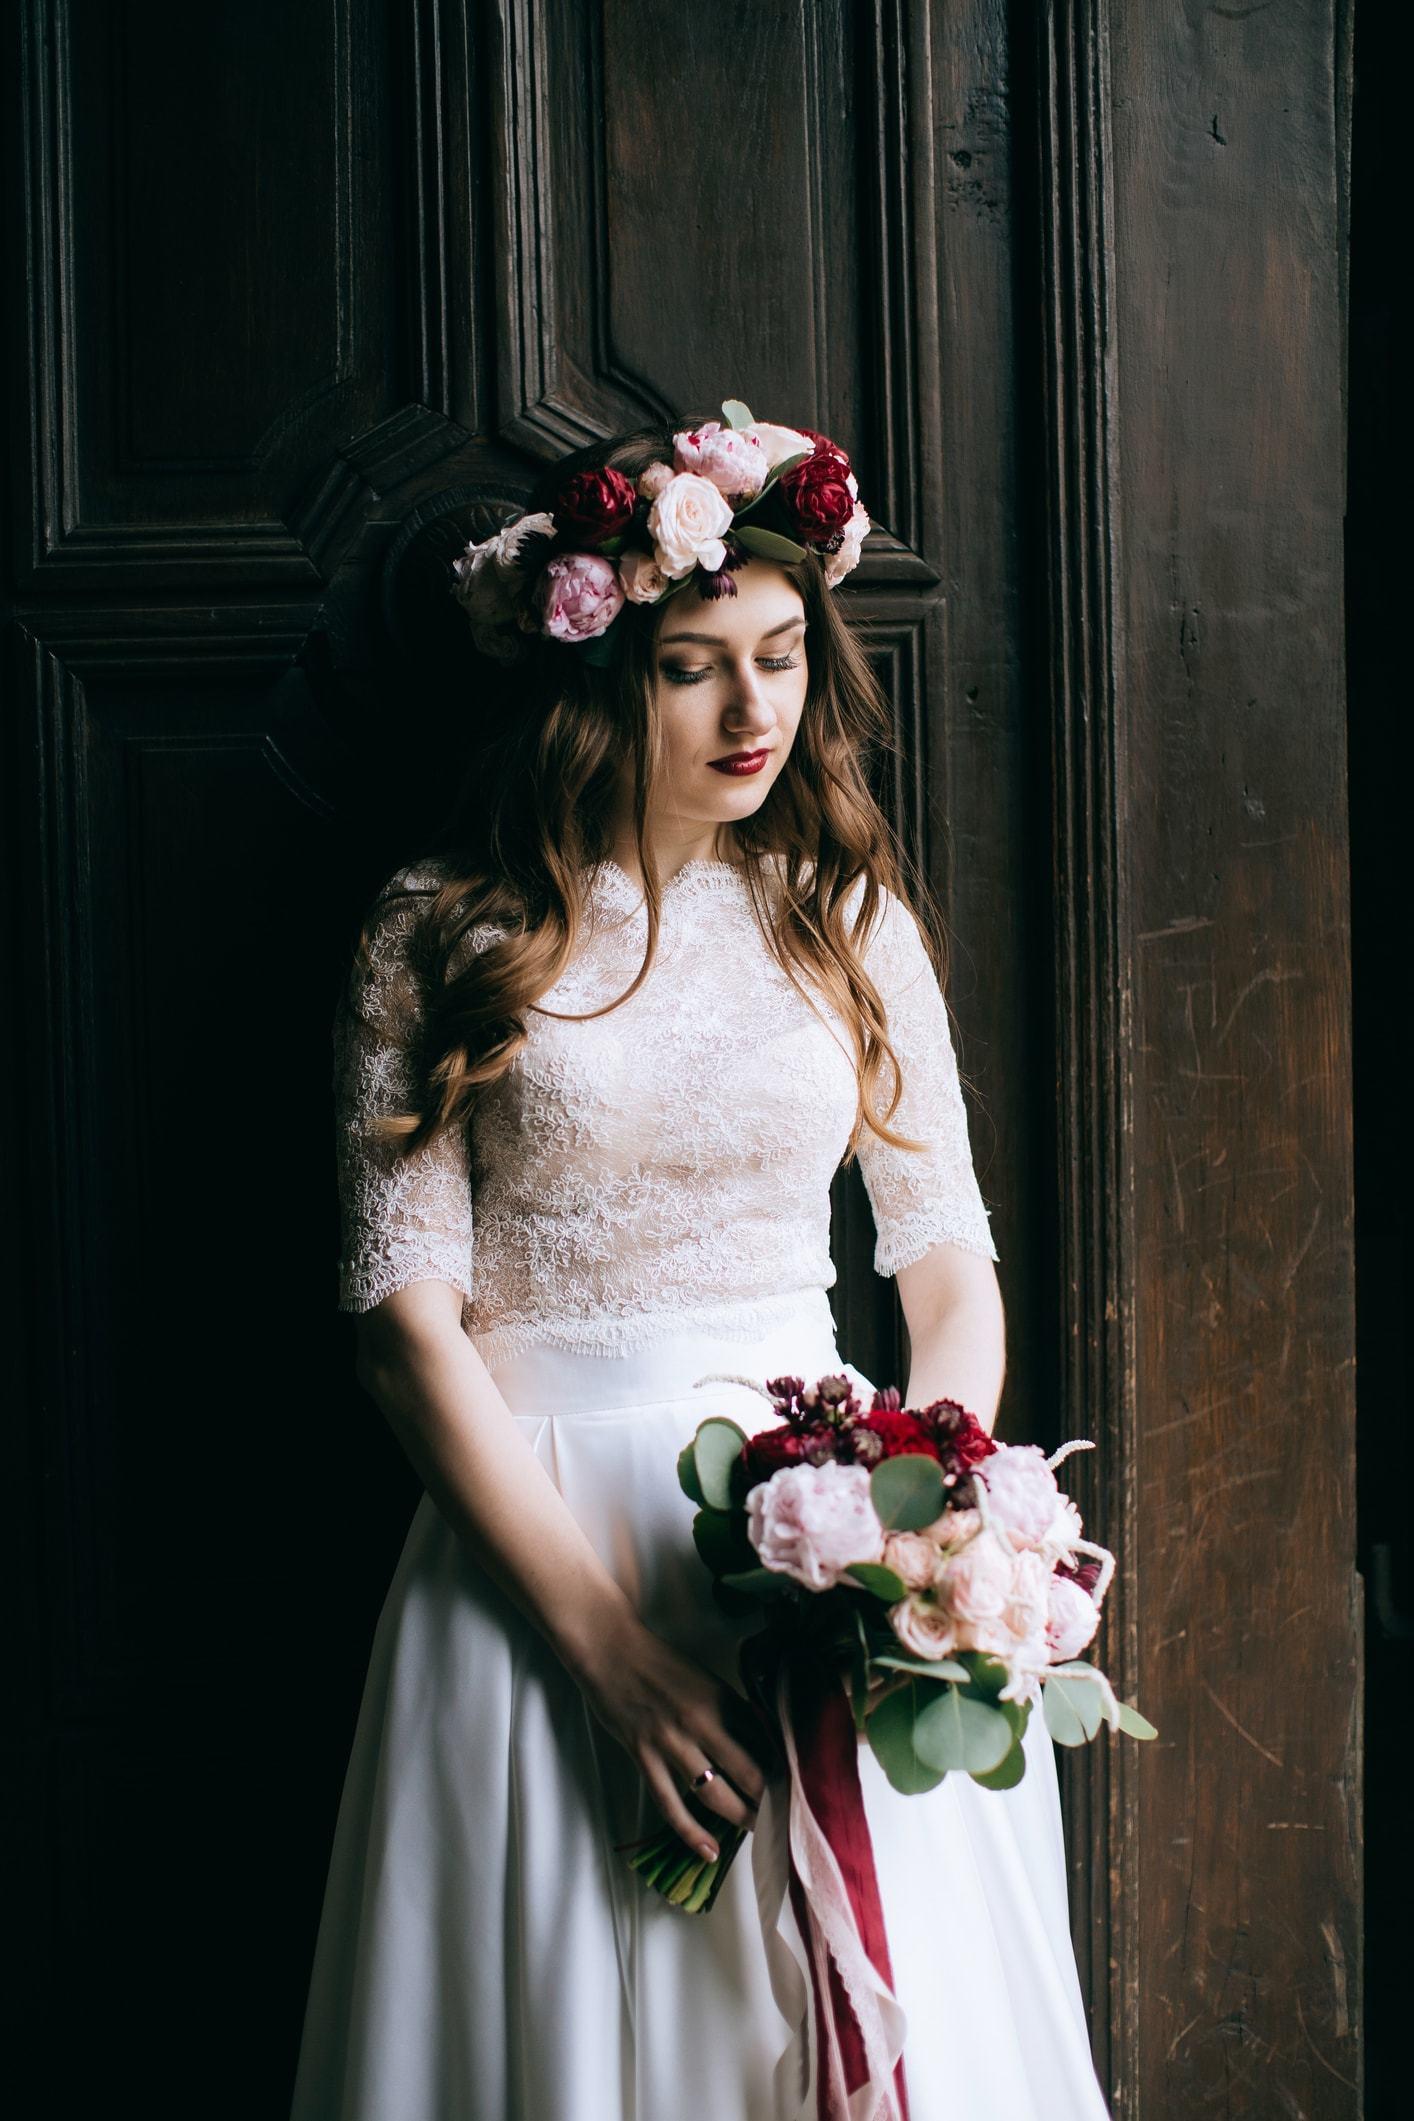 Wedding hair down with flower crown flowers healthy wedding hairstyles down brunette oversized flower crown izmirmasajfo